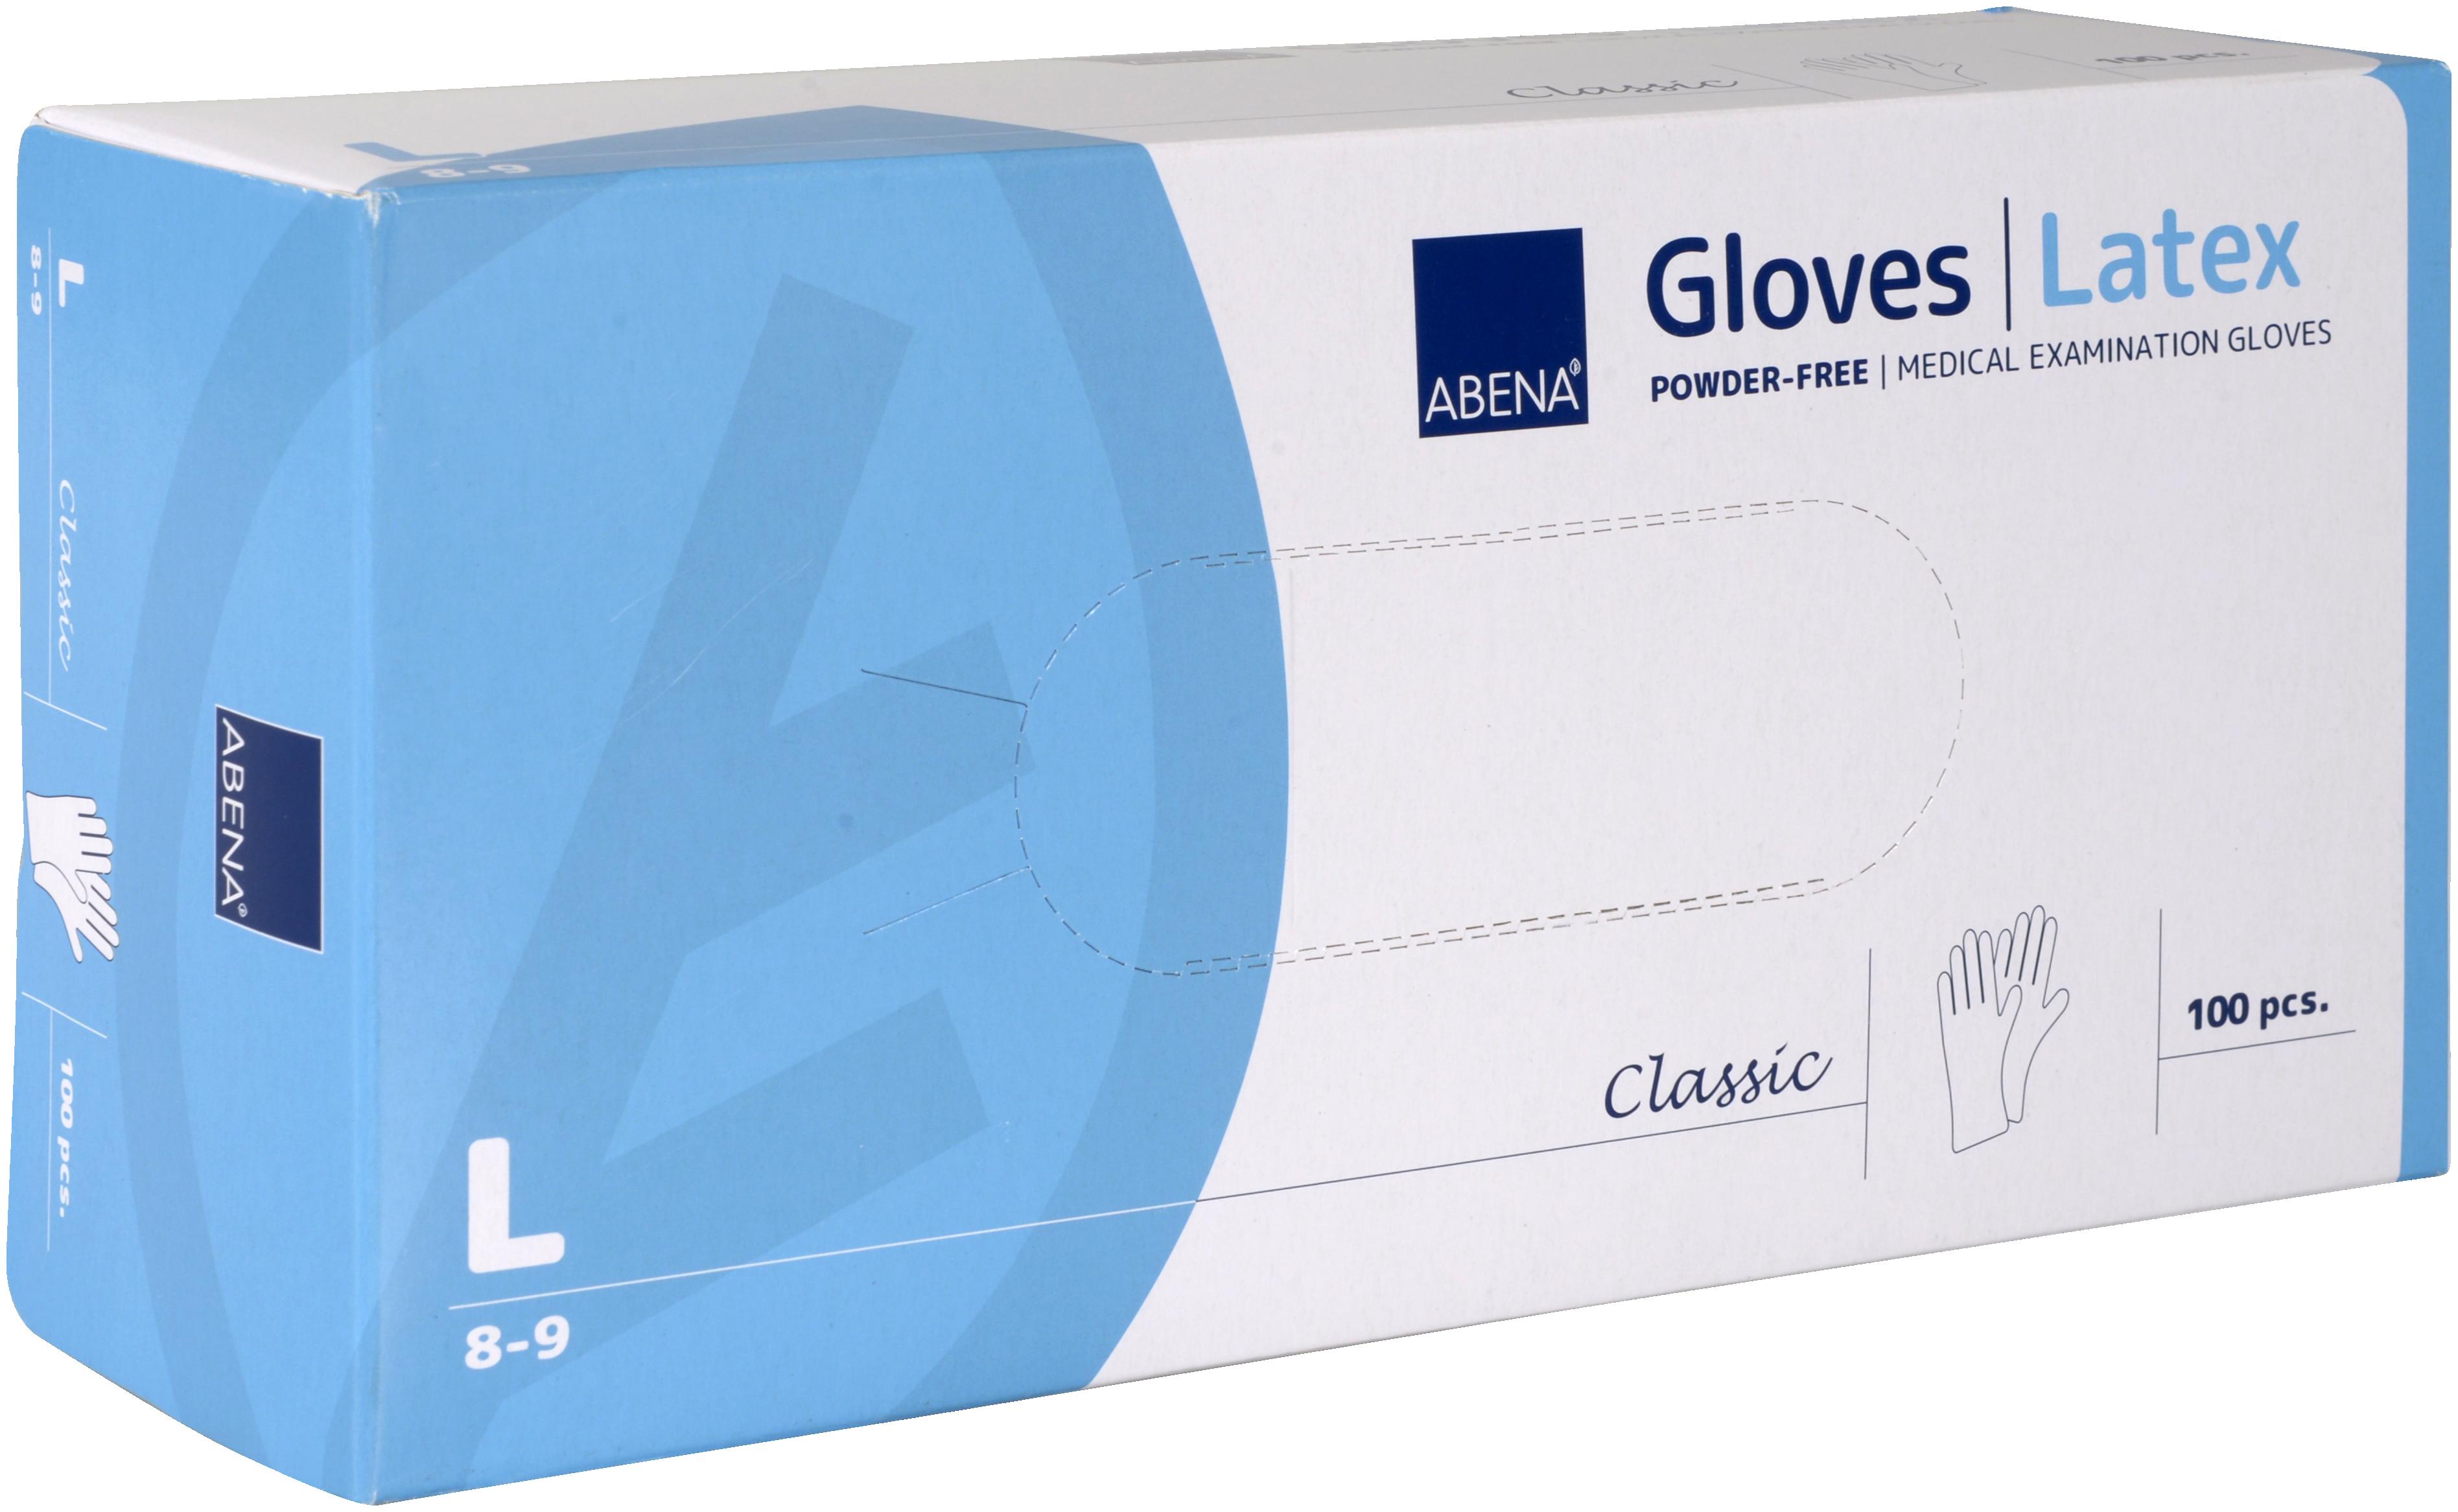 Abena Classic Latex Handschuh Größe L, 10 x 100 Stück, puderfrei, weiß, Gr. L